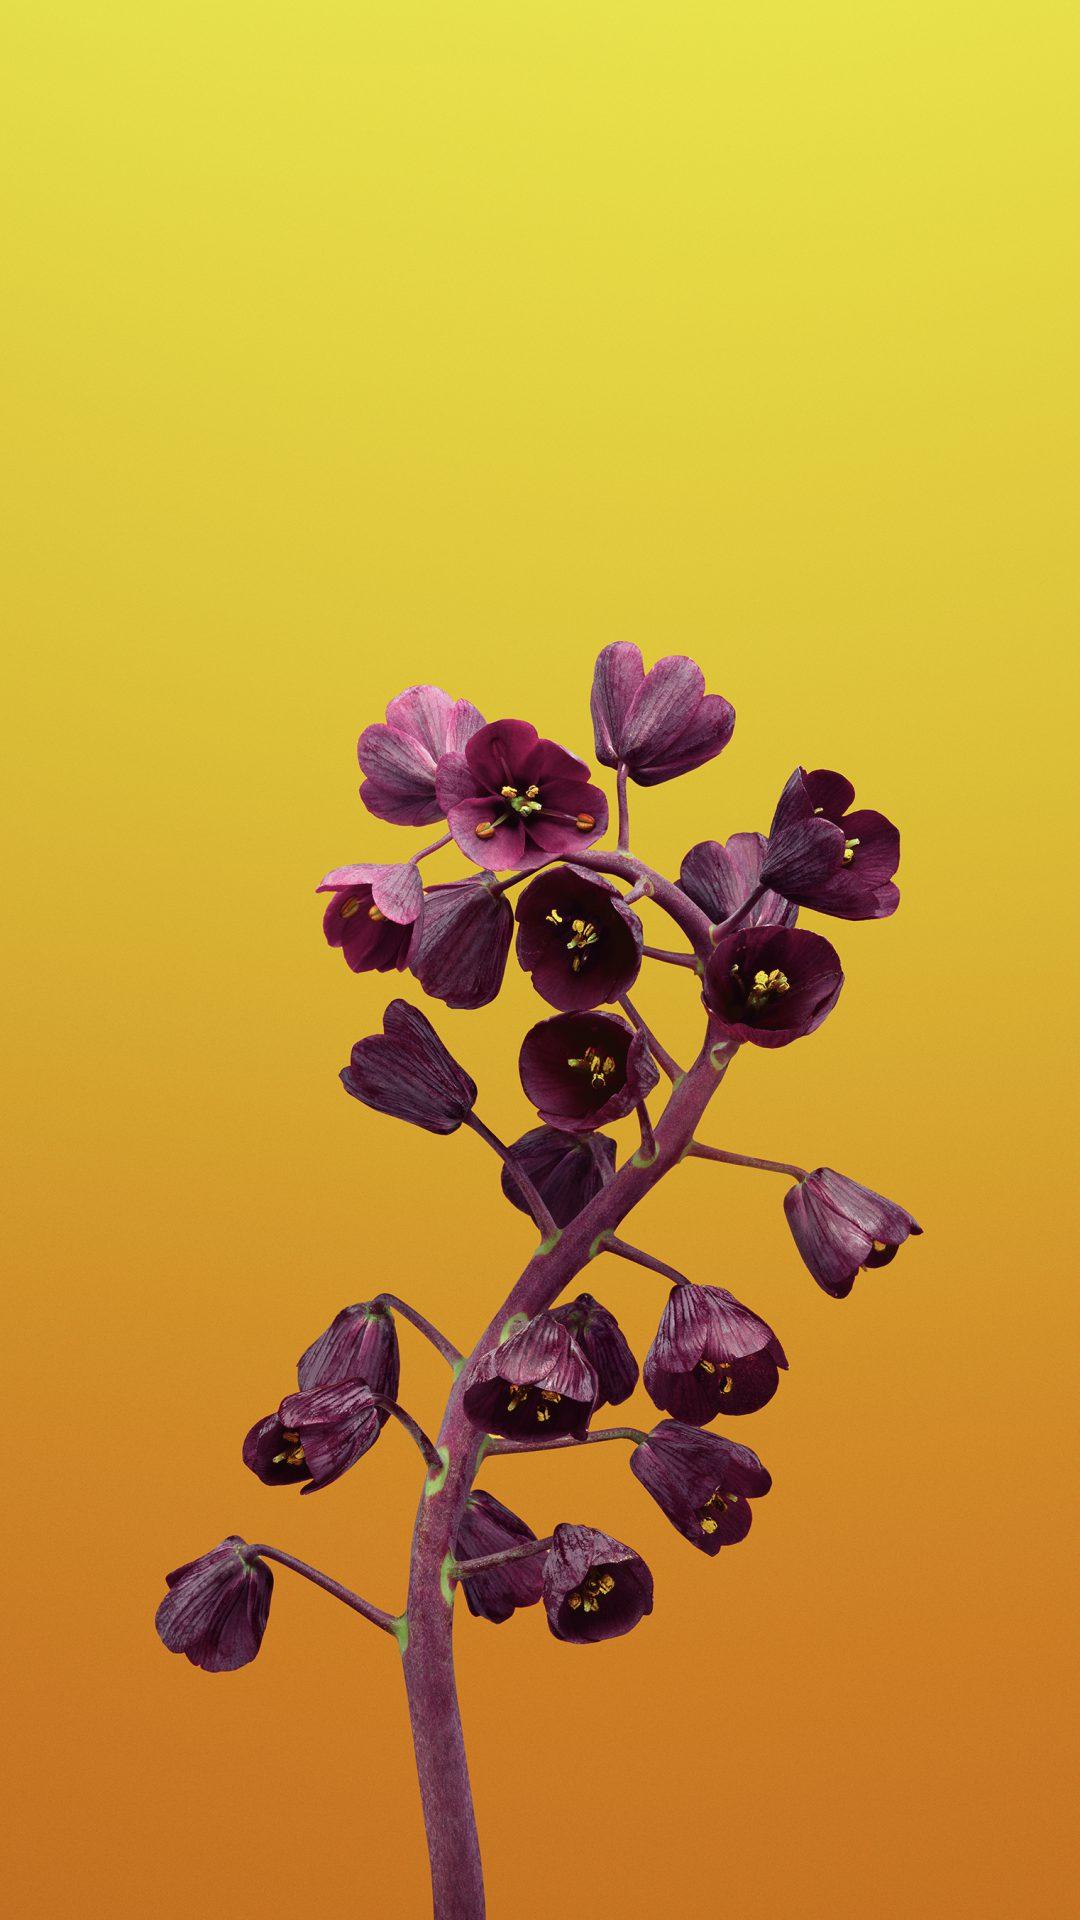 Flower FRITILLARIA